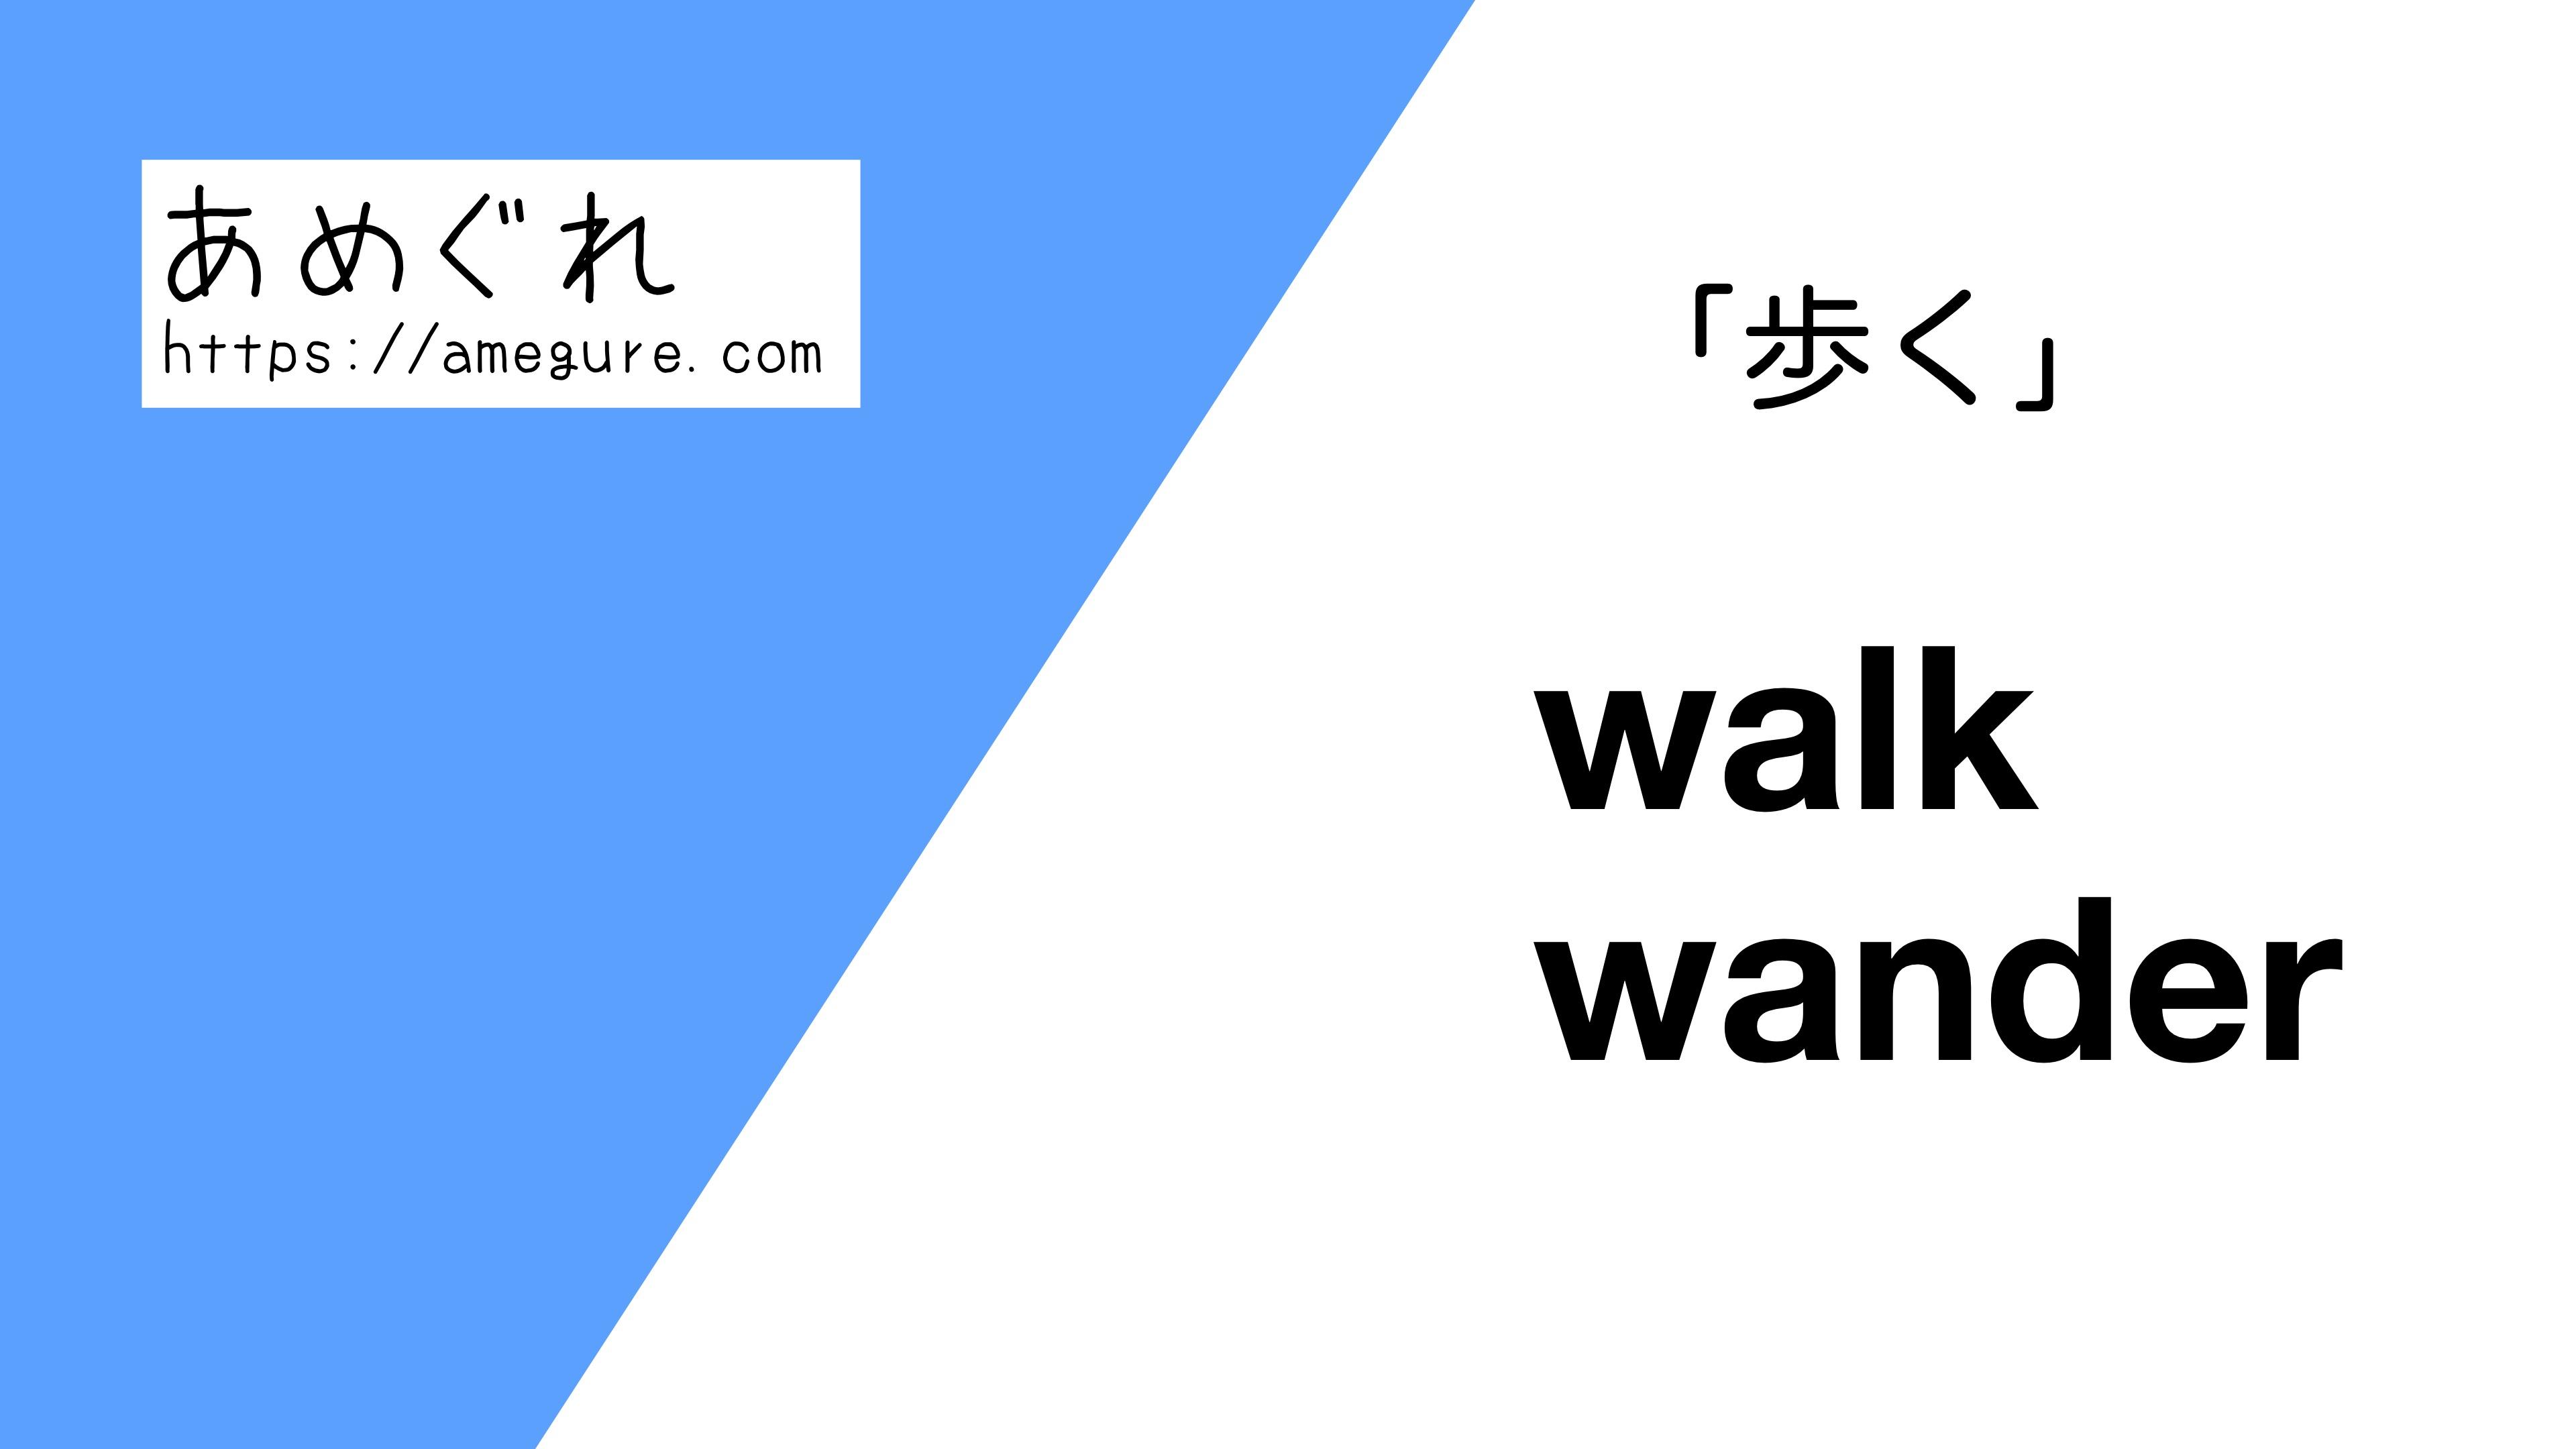 walk-wander違い